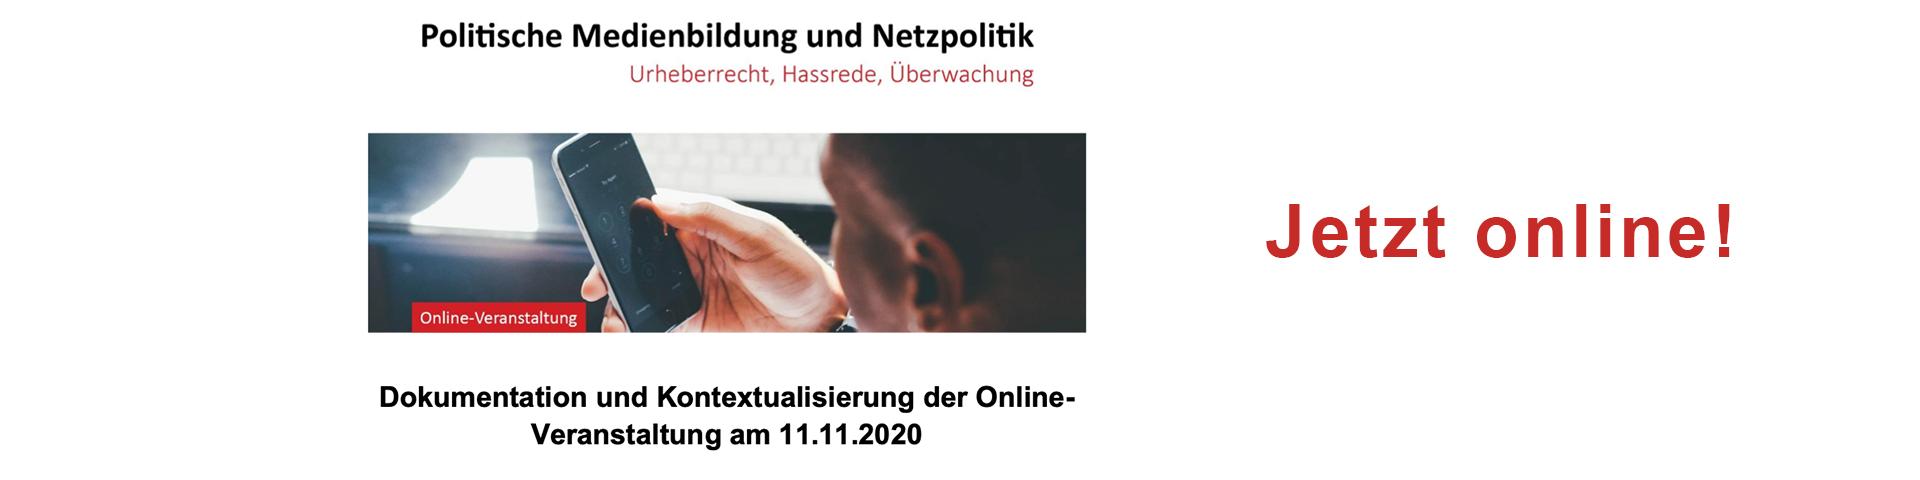 Www.Netzpolitik.Org